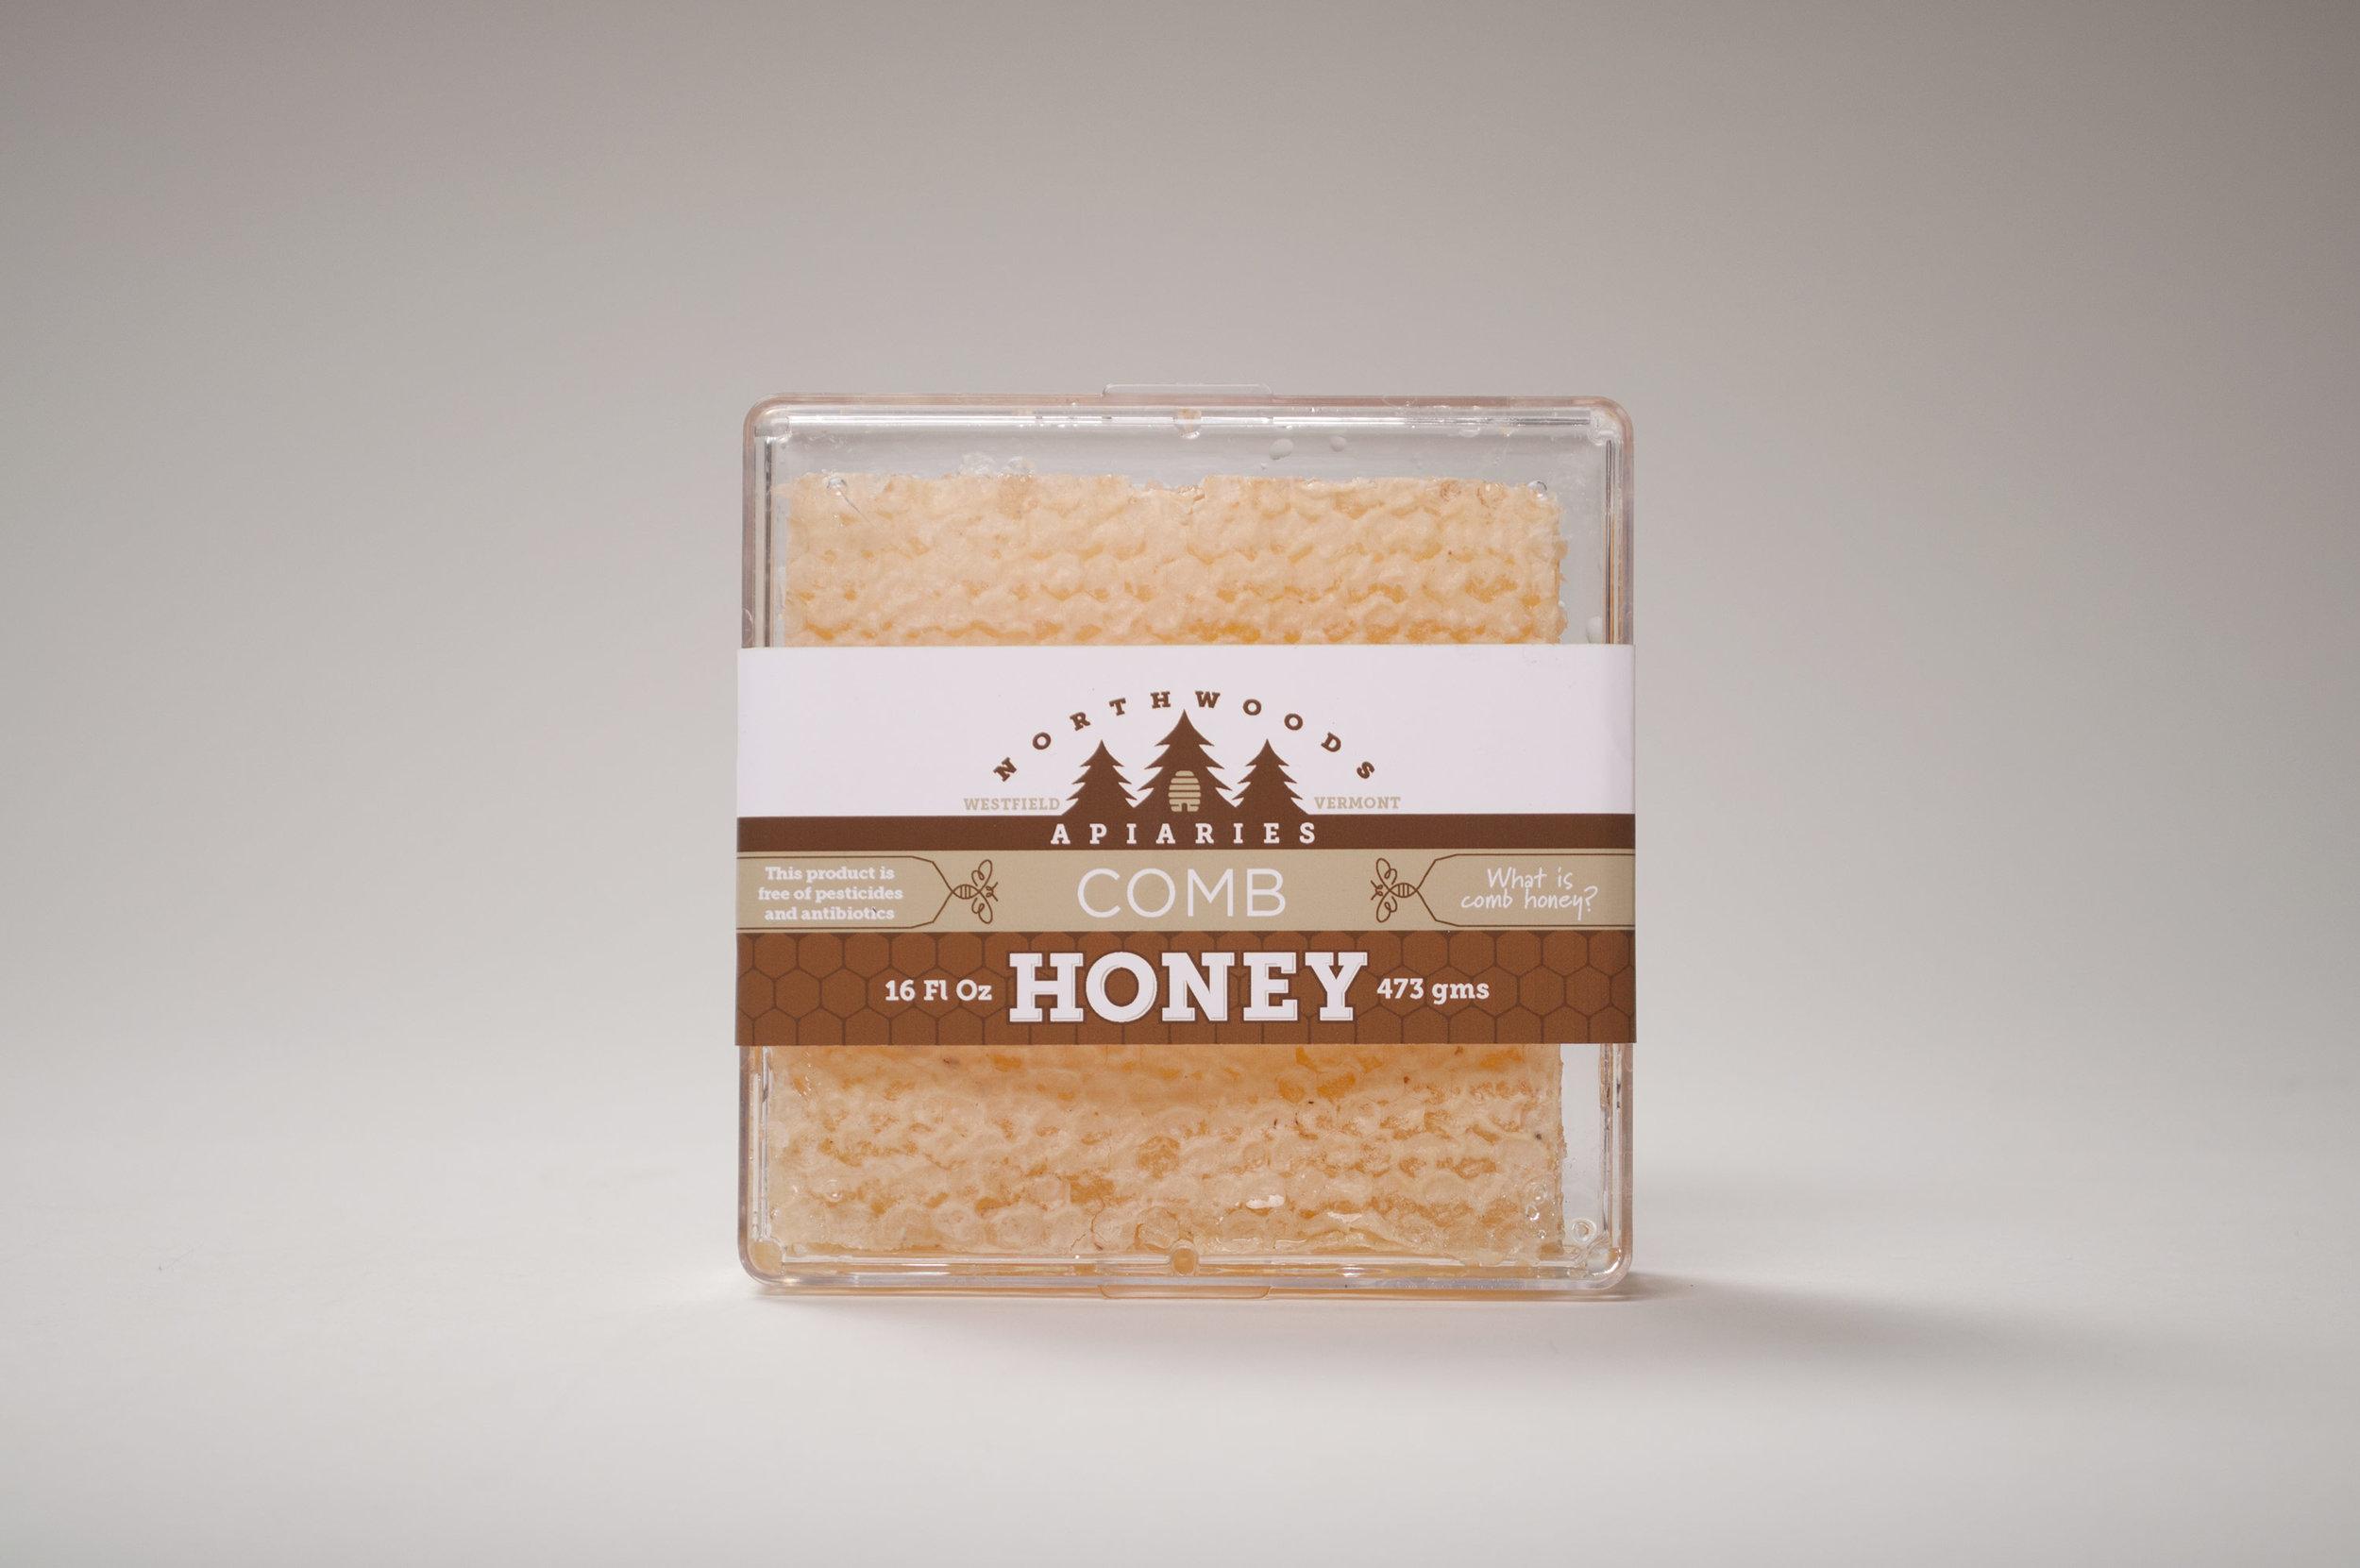 Northwoods Apiaries Honey Comb Packaging